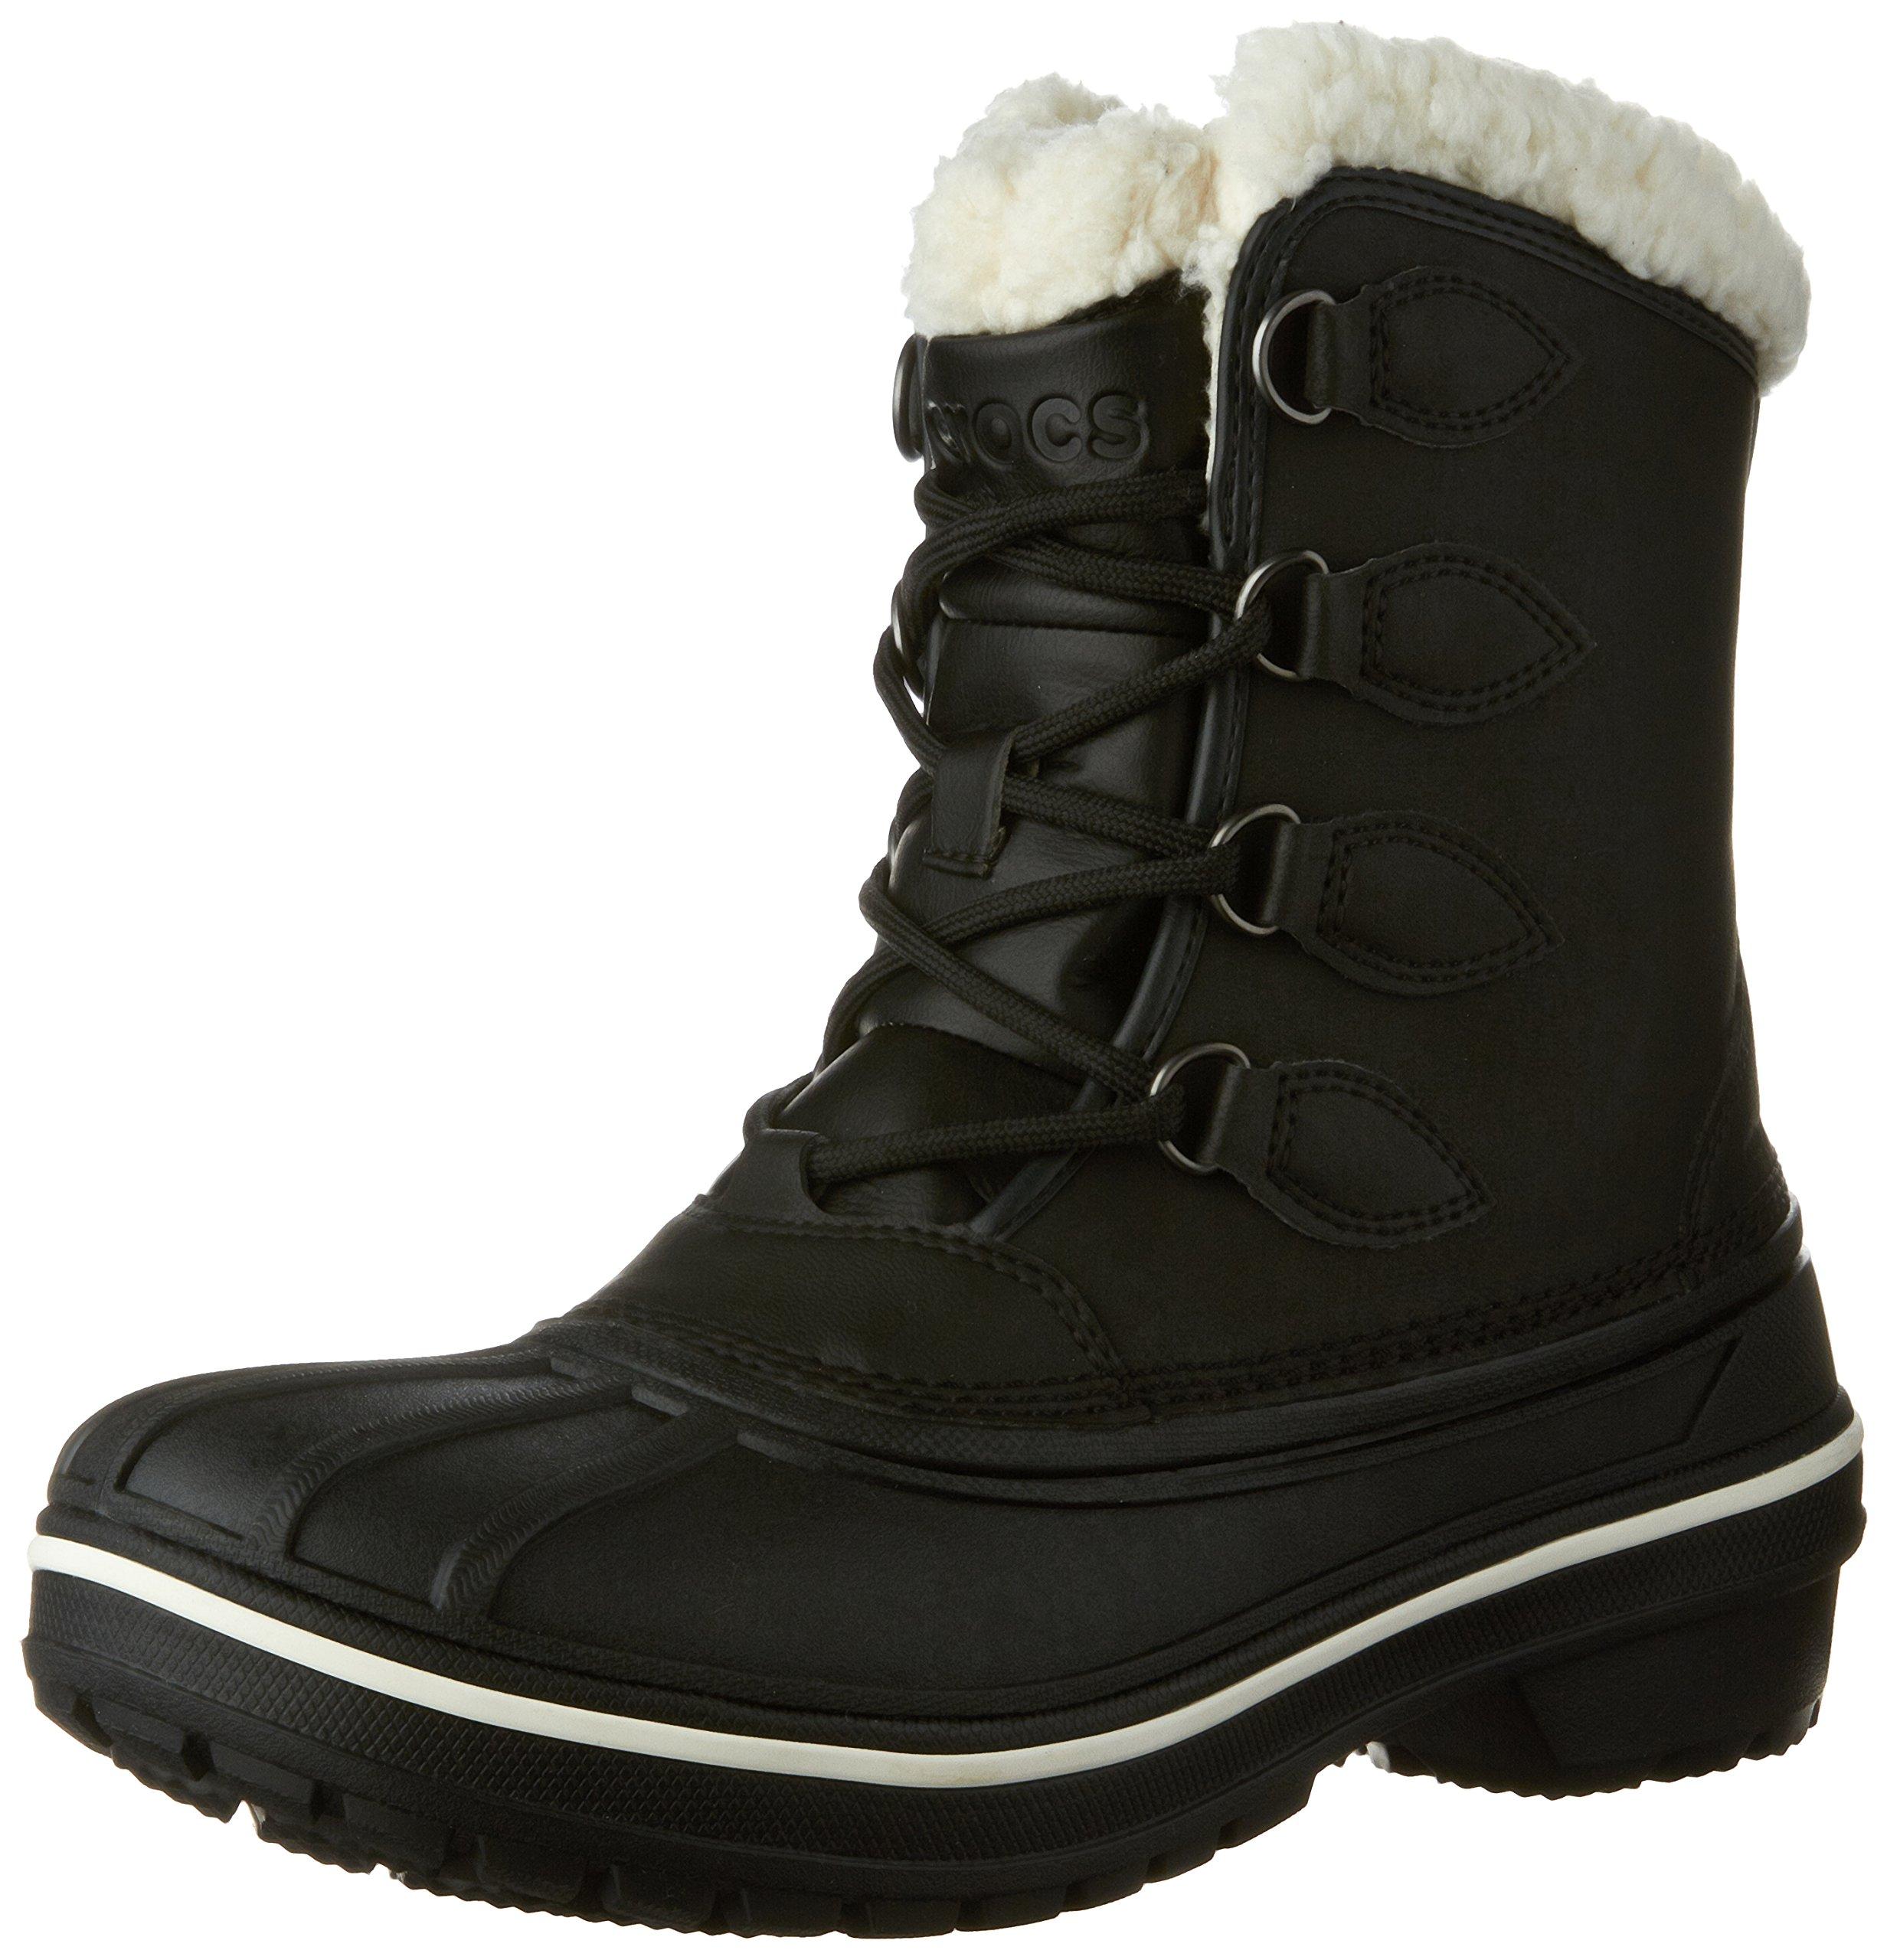 Crocs Women's AllCast II Snow Boot, Black, 10 M US